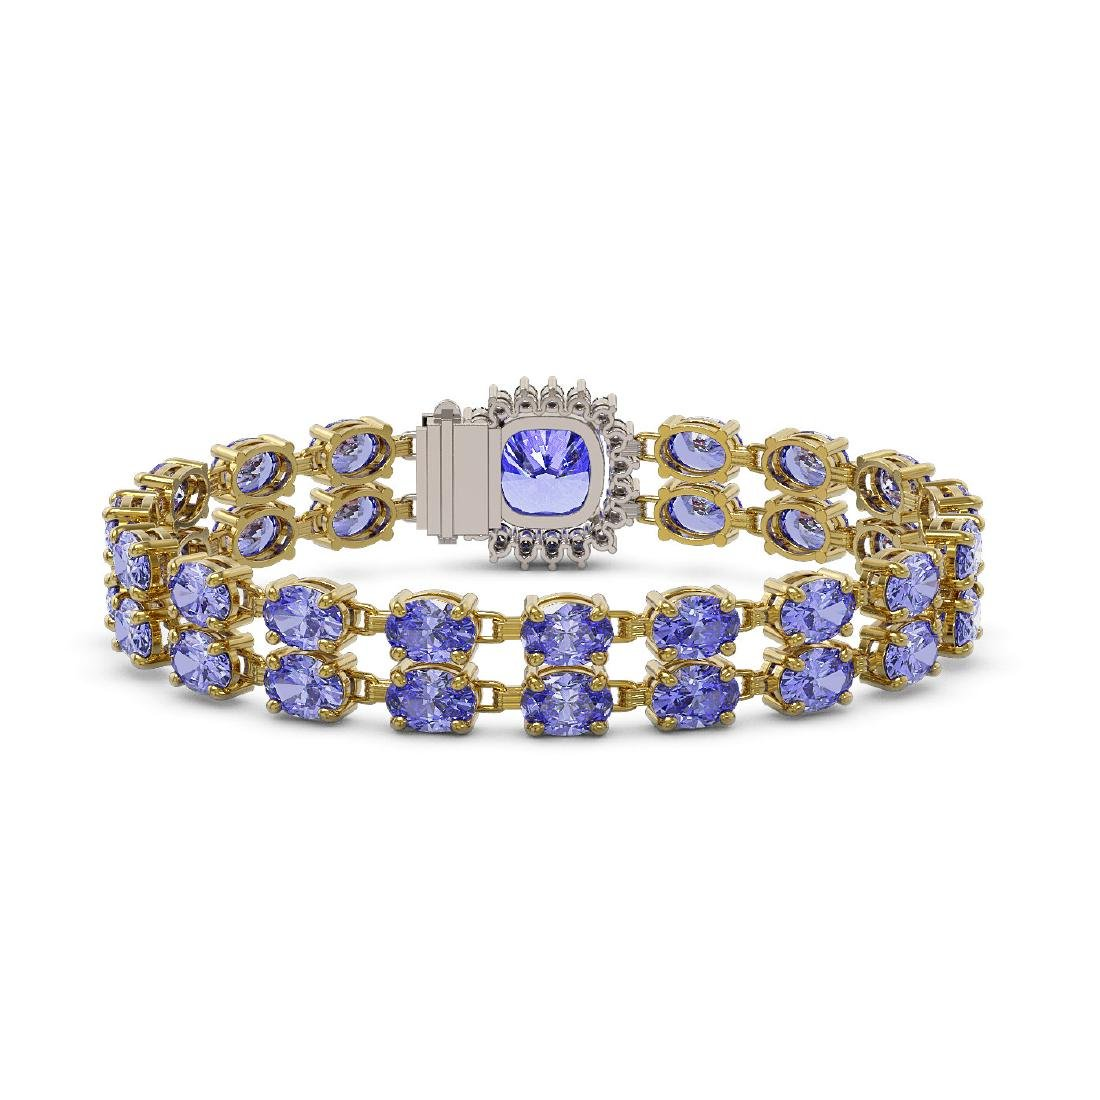 30.43 ctw Tanzanite & Diamond Bracelet 14K Yellow Gold - 3